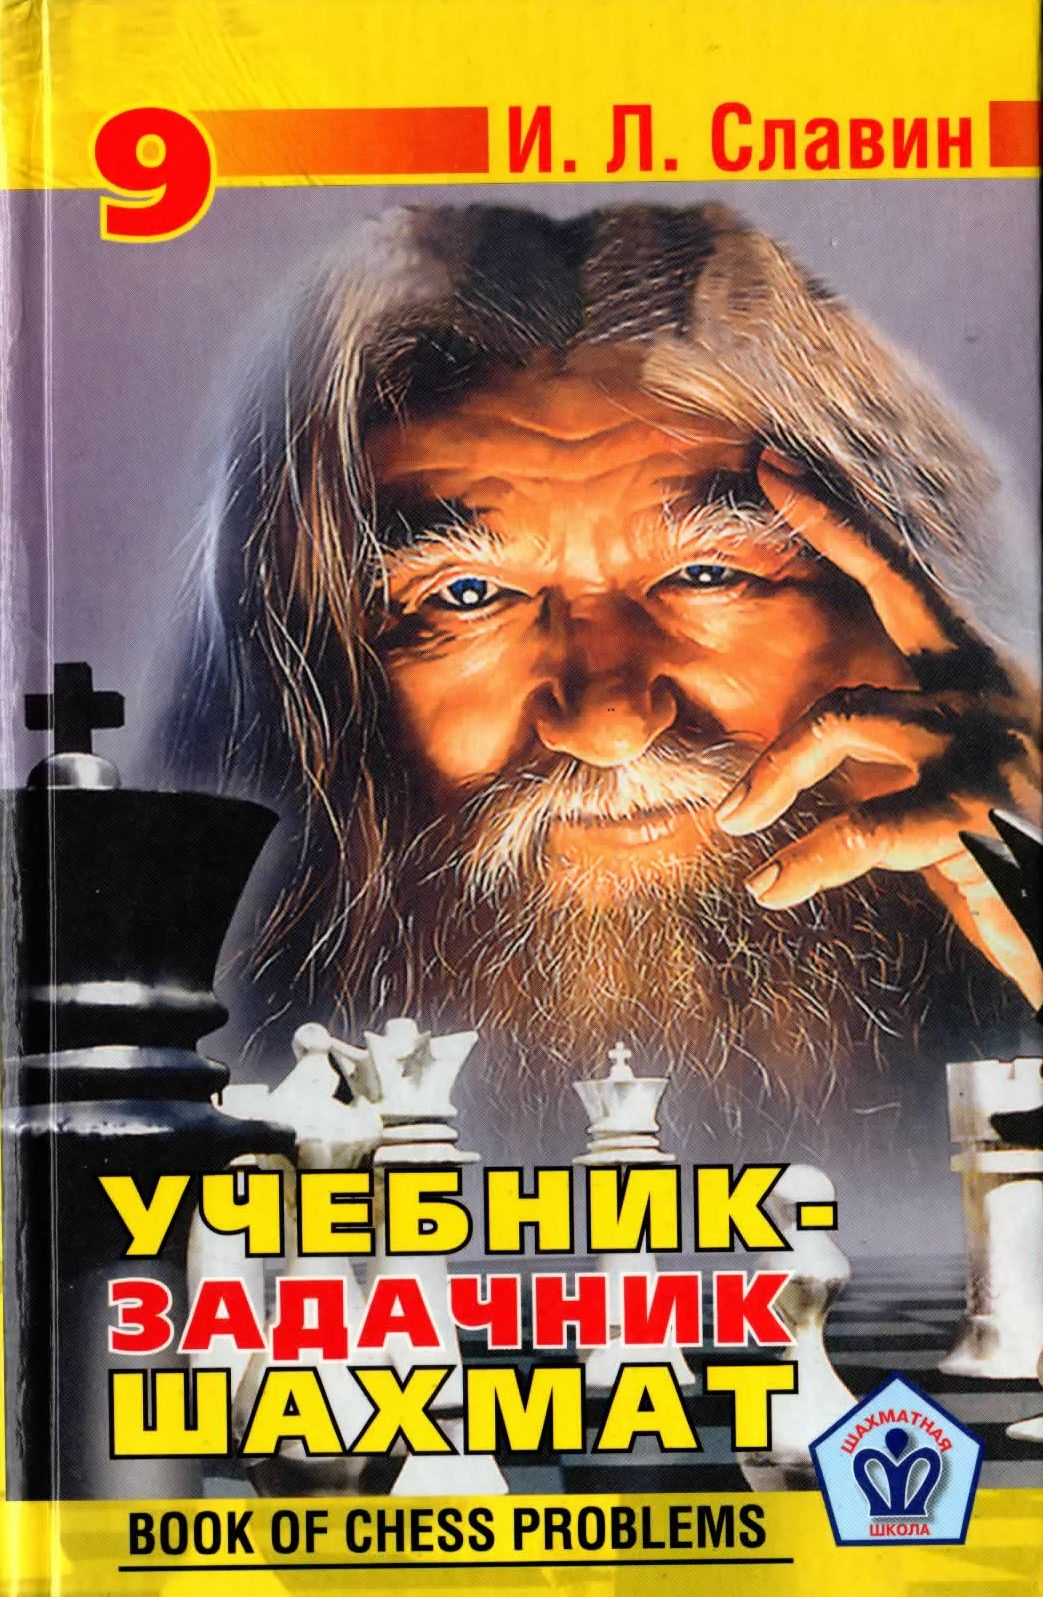 славин учебник задачник шахмат том 4